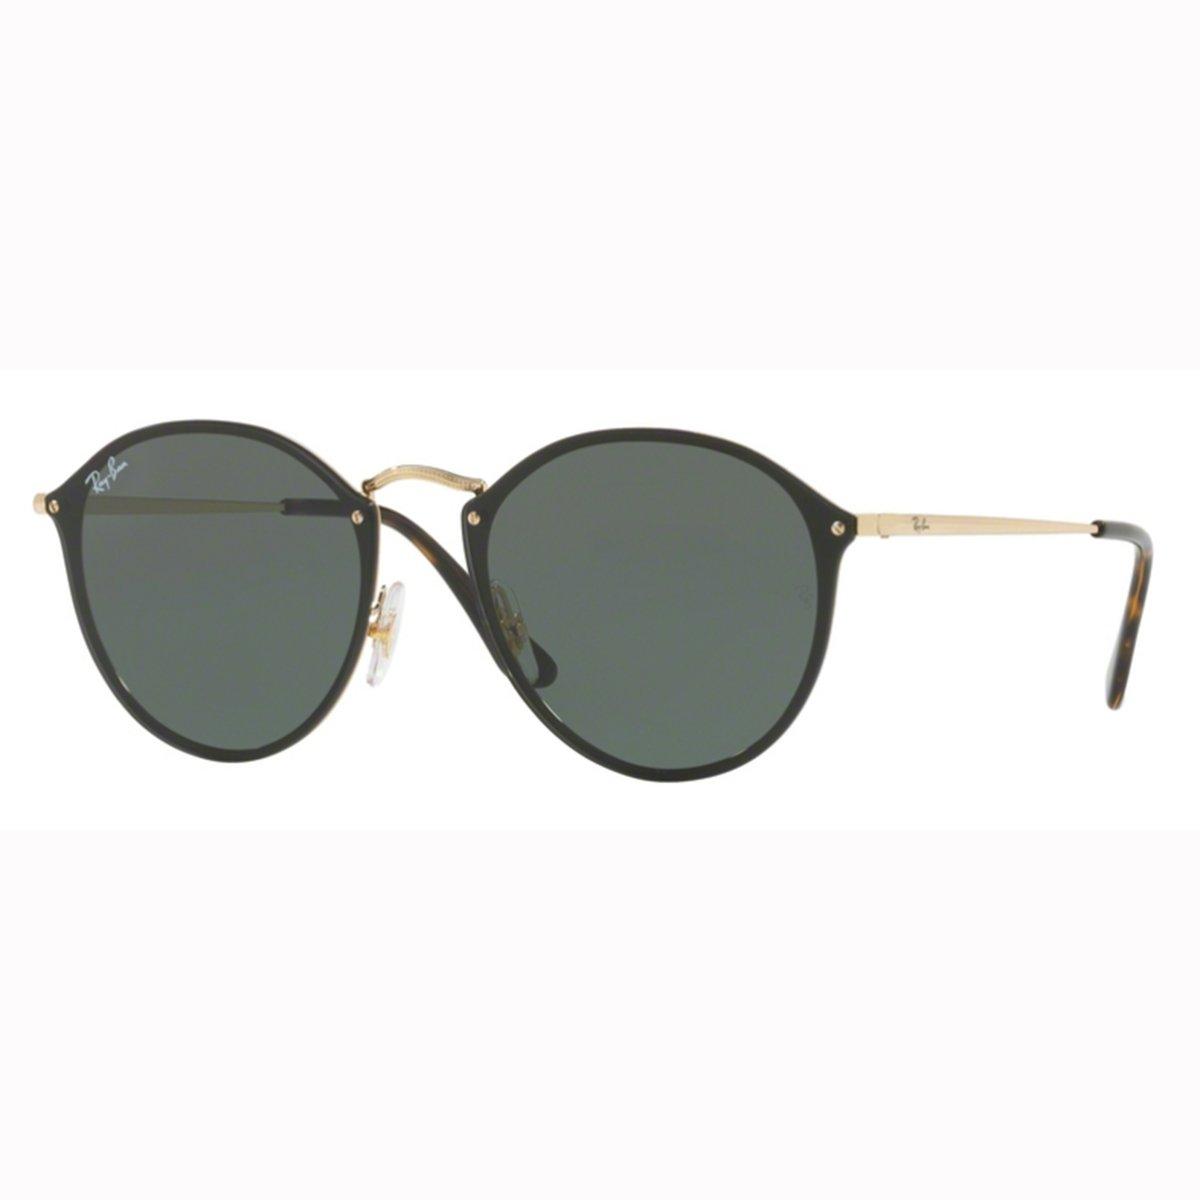 Compre Óculos de Sol Ray Ban Blaze Round em 10X   Tri-Jóia Shop c69418d360